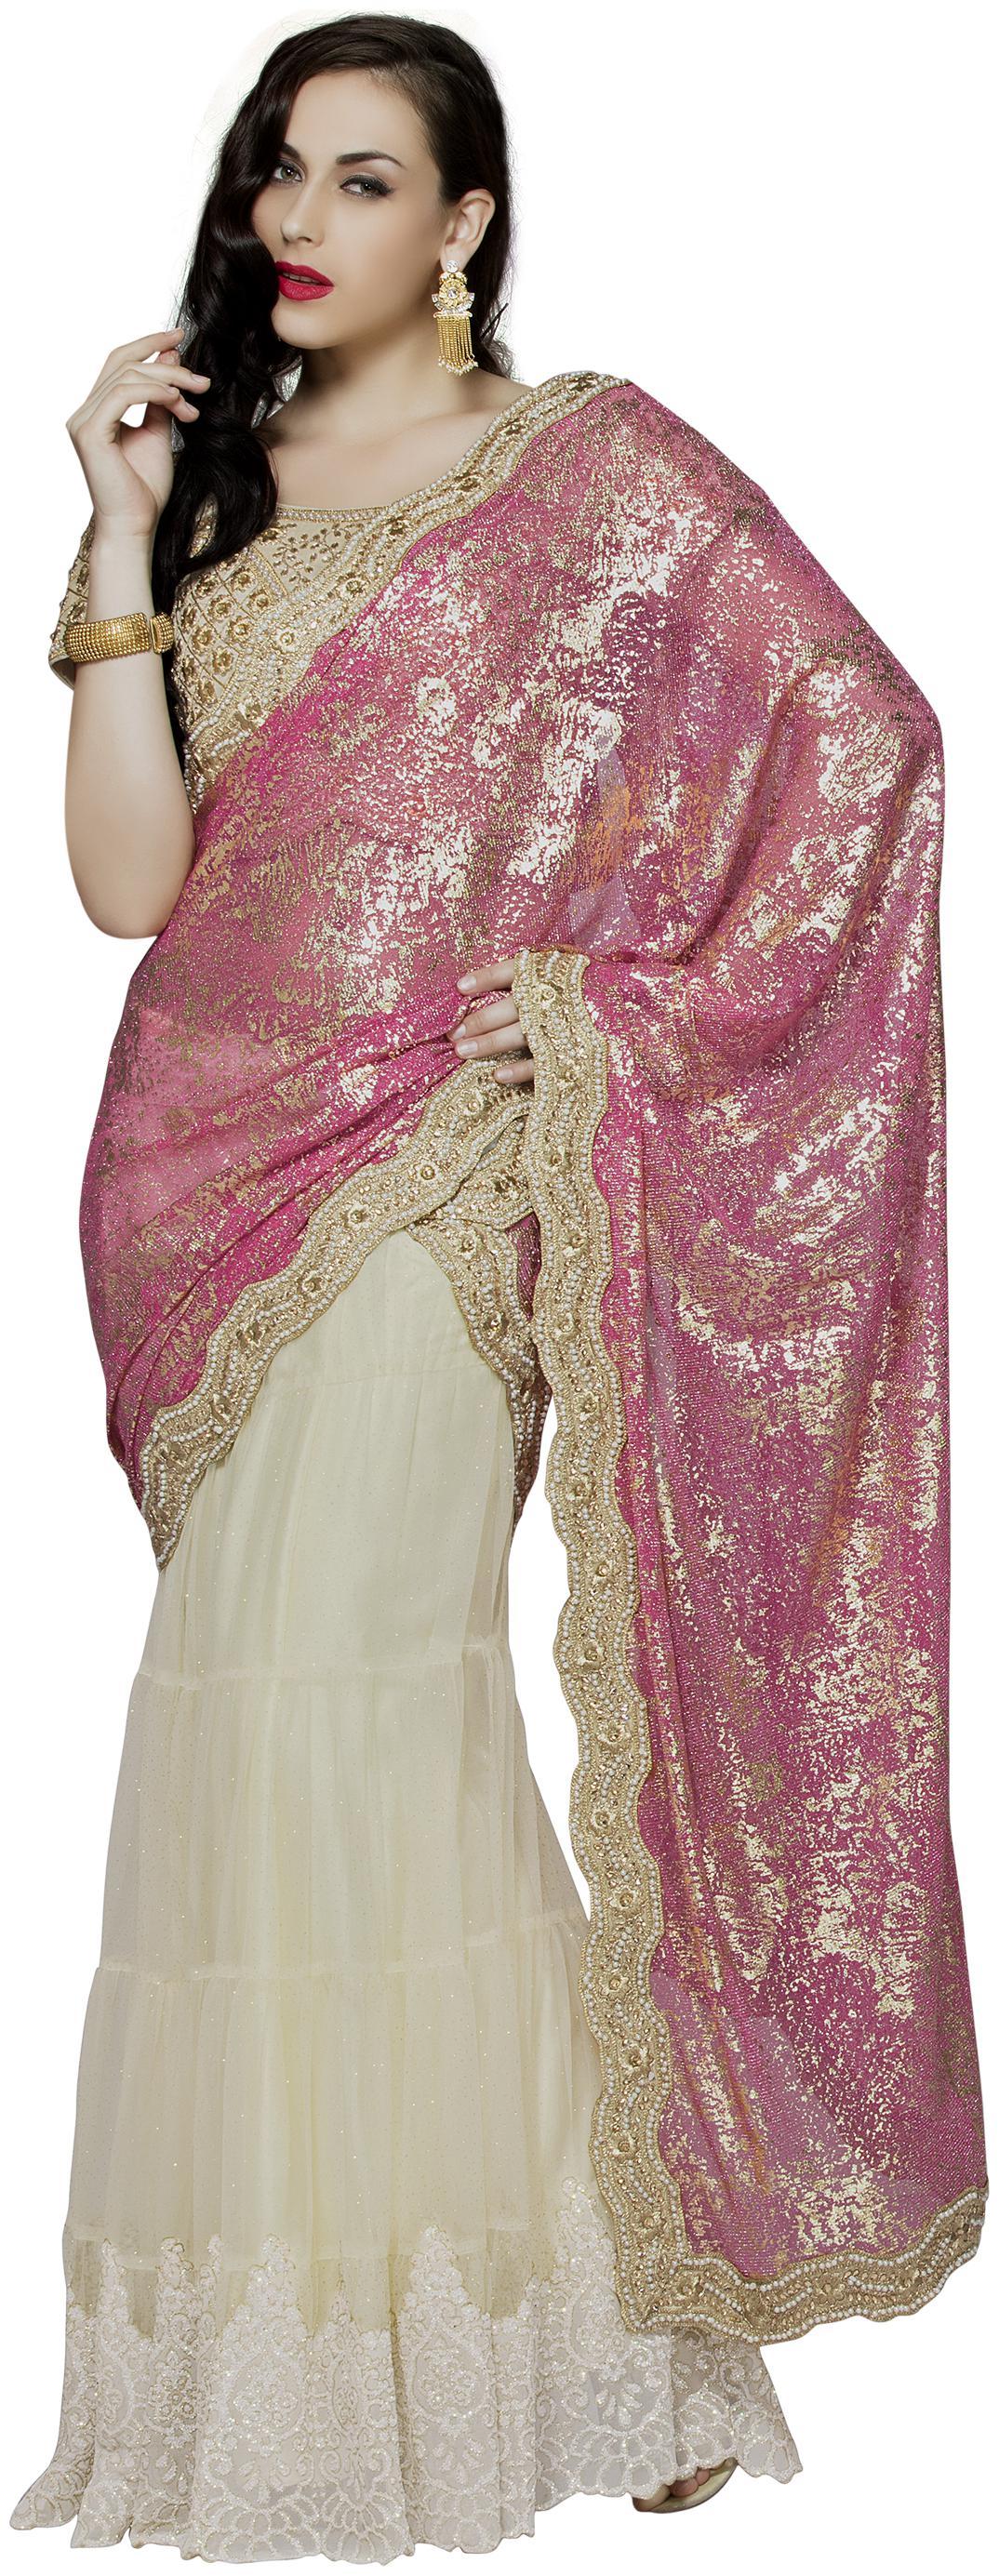 2bcb21b56a Women Sarees Online - Party Wear Designer Saree & Fancy Saris Online